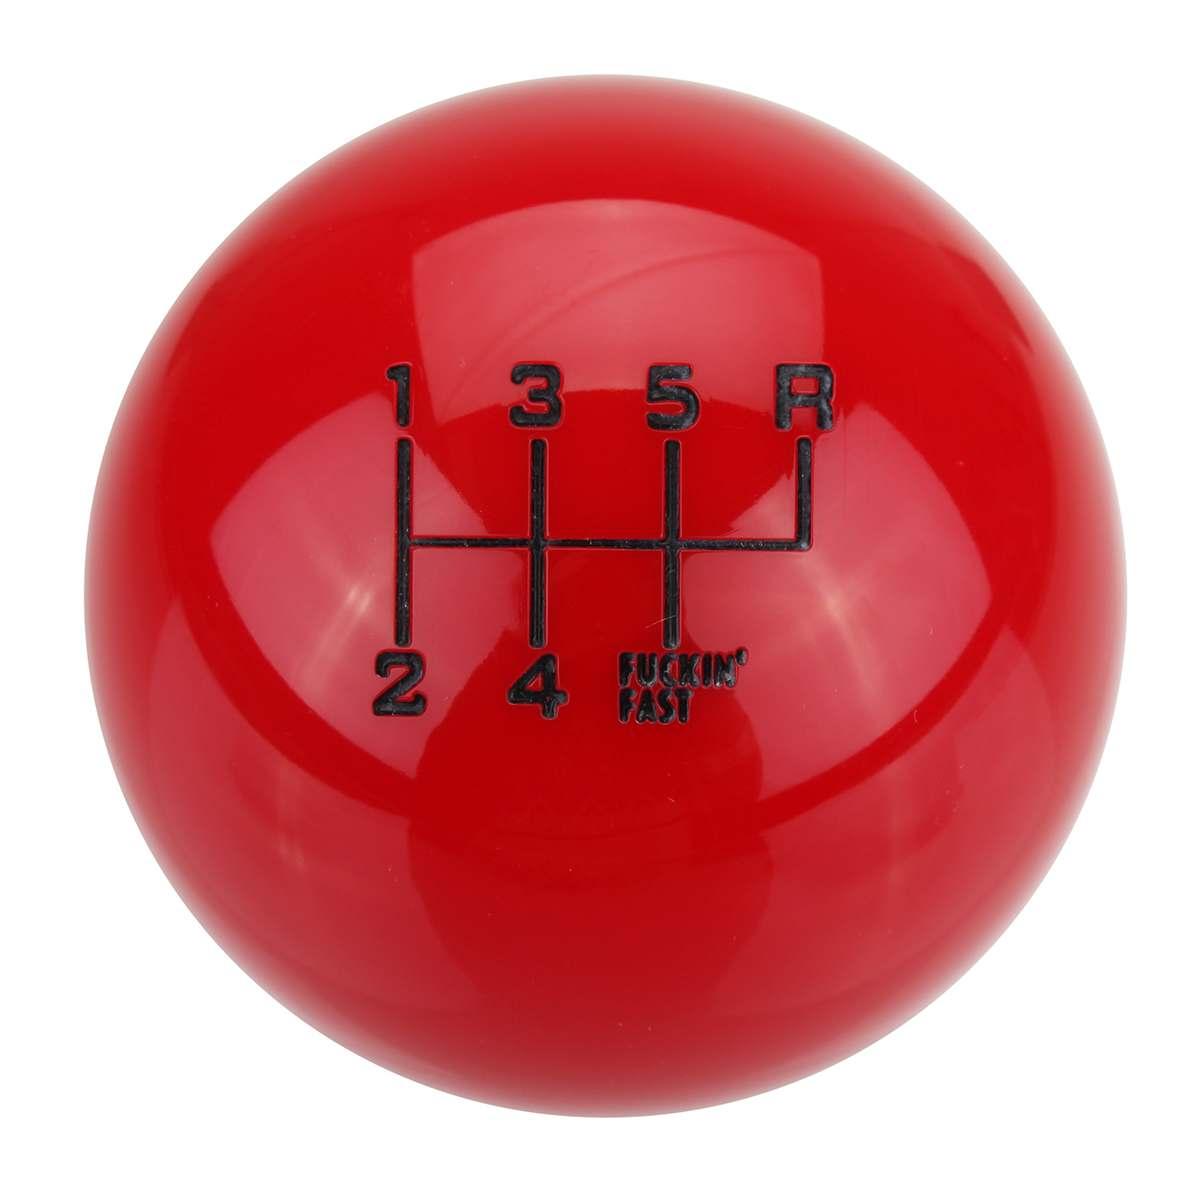 Universal 6 Speed Car Manual Round Ball Gear Shift Knob Ball Short Throw Shifter Lever Black